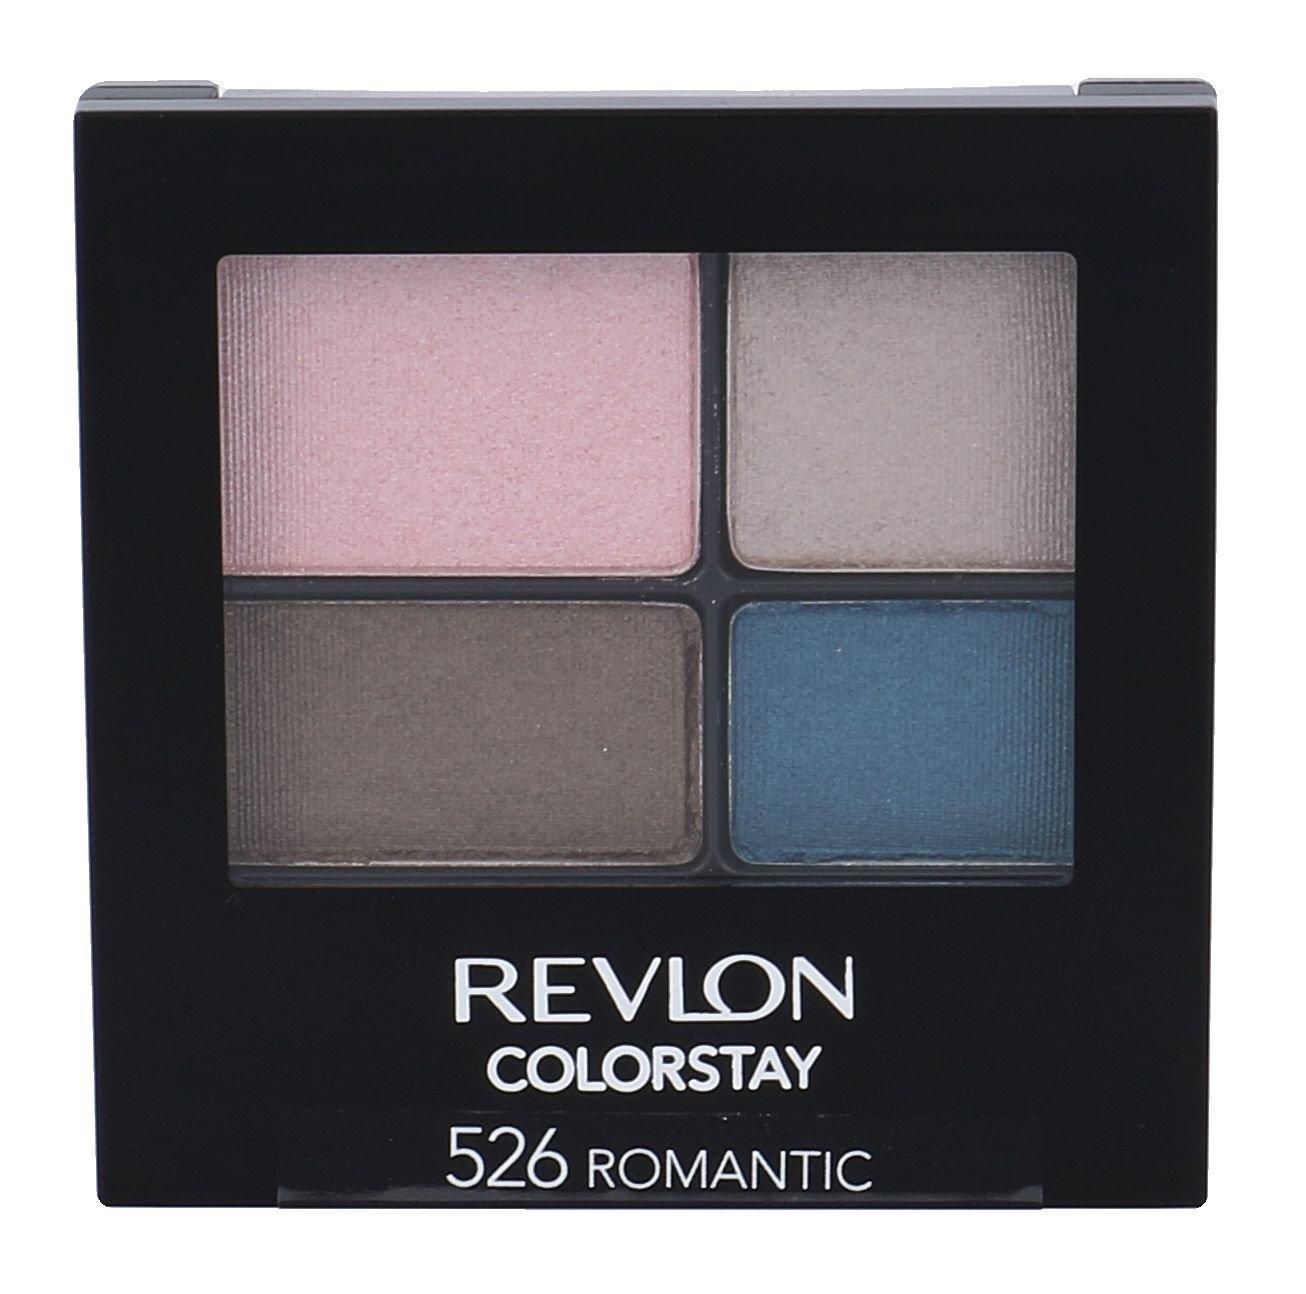 Revlon Colorstay Cosmetic 4,8ml 526 Romantic